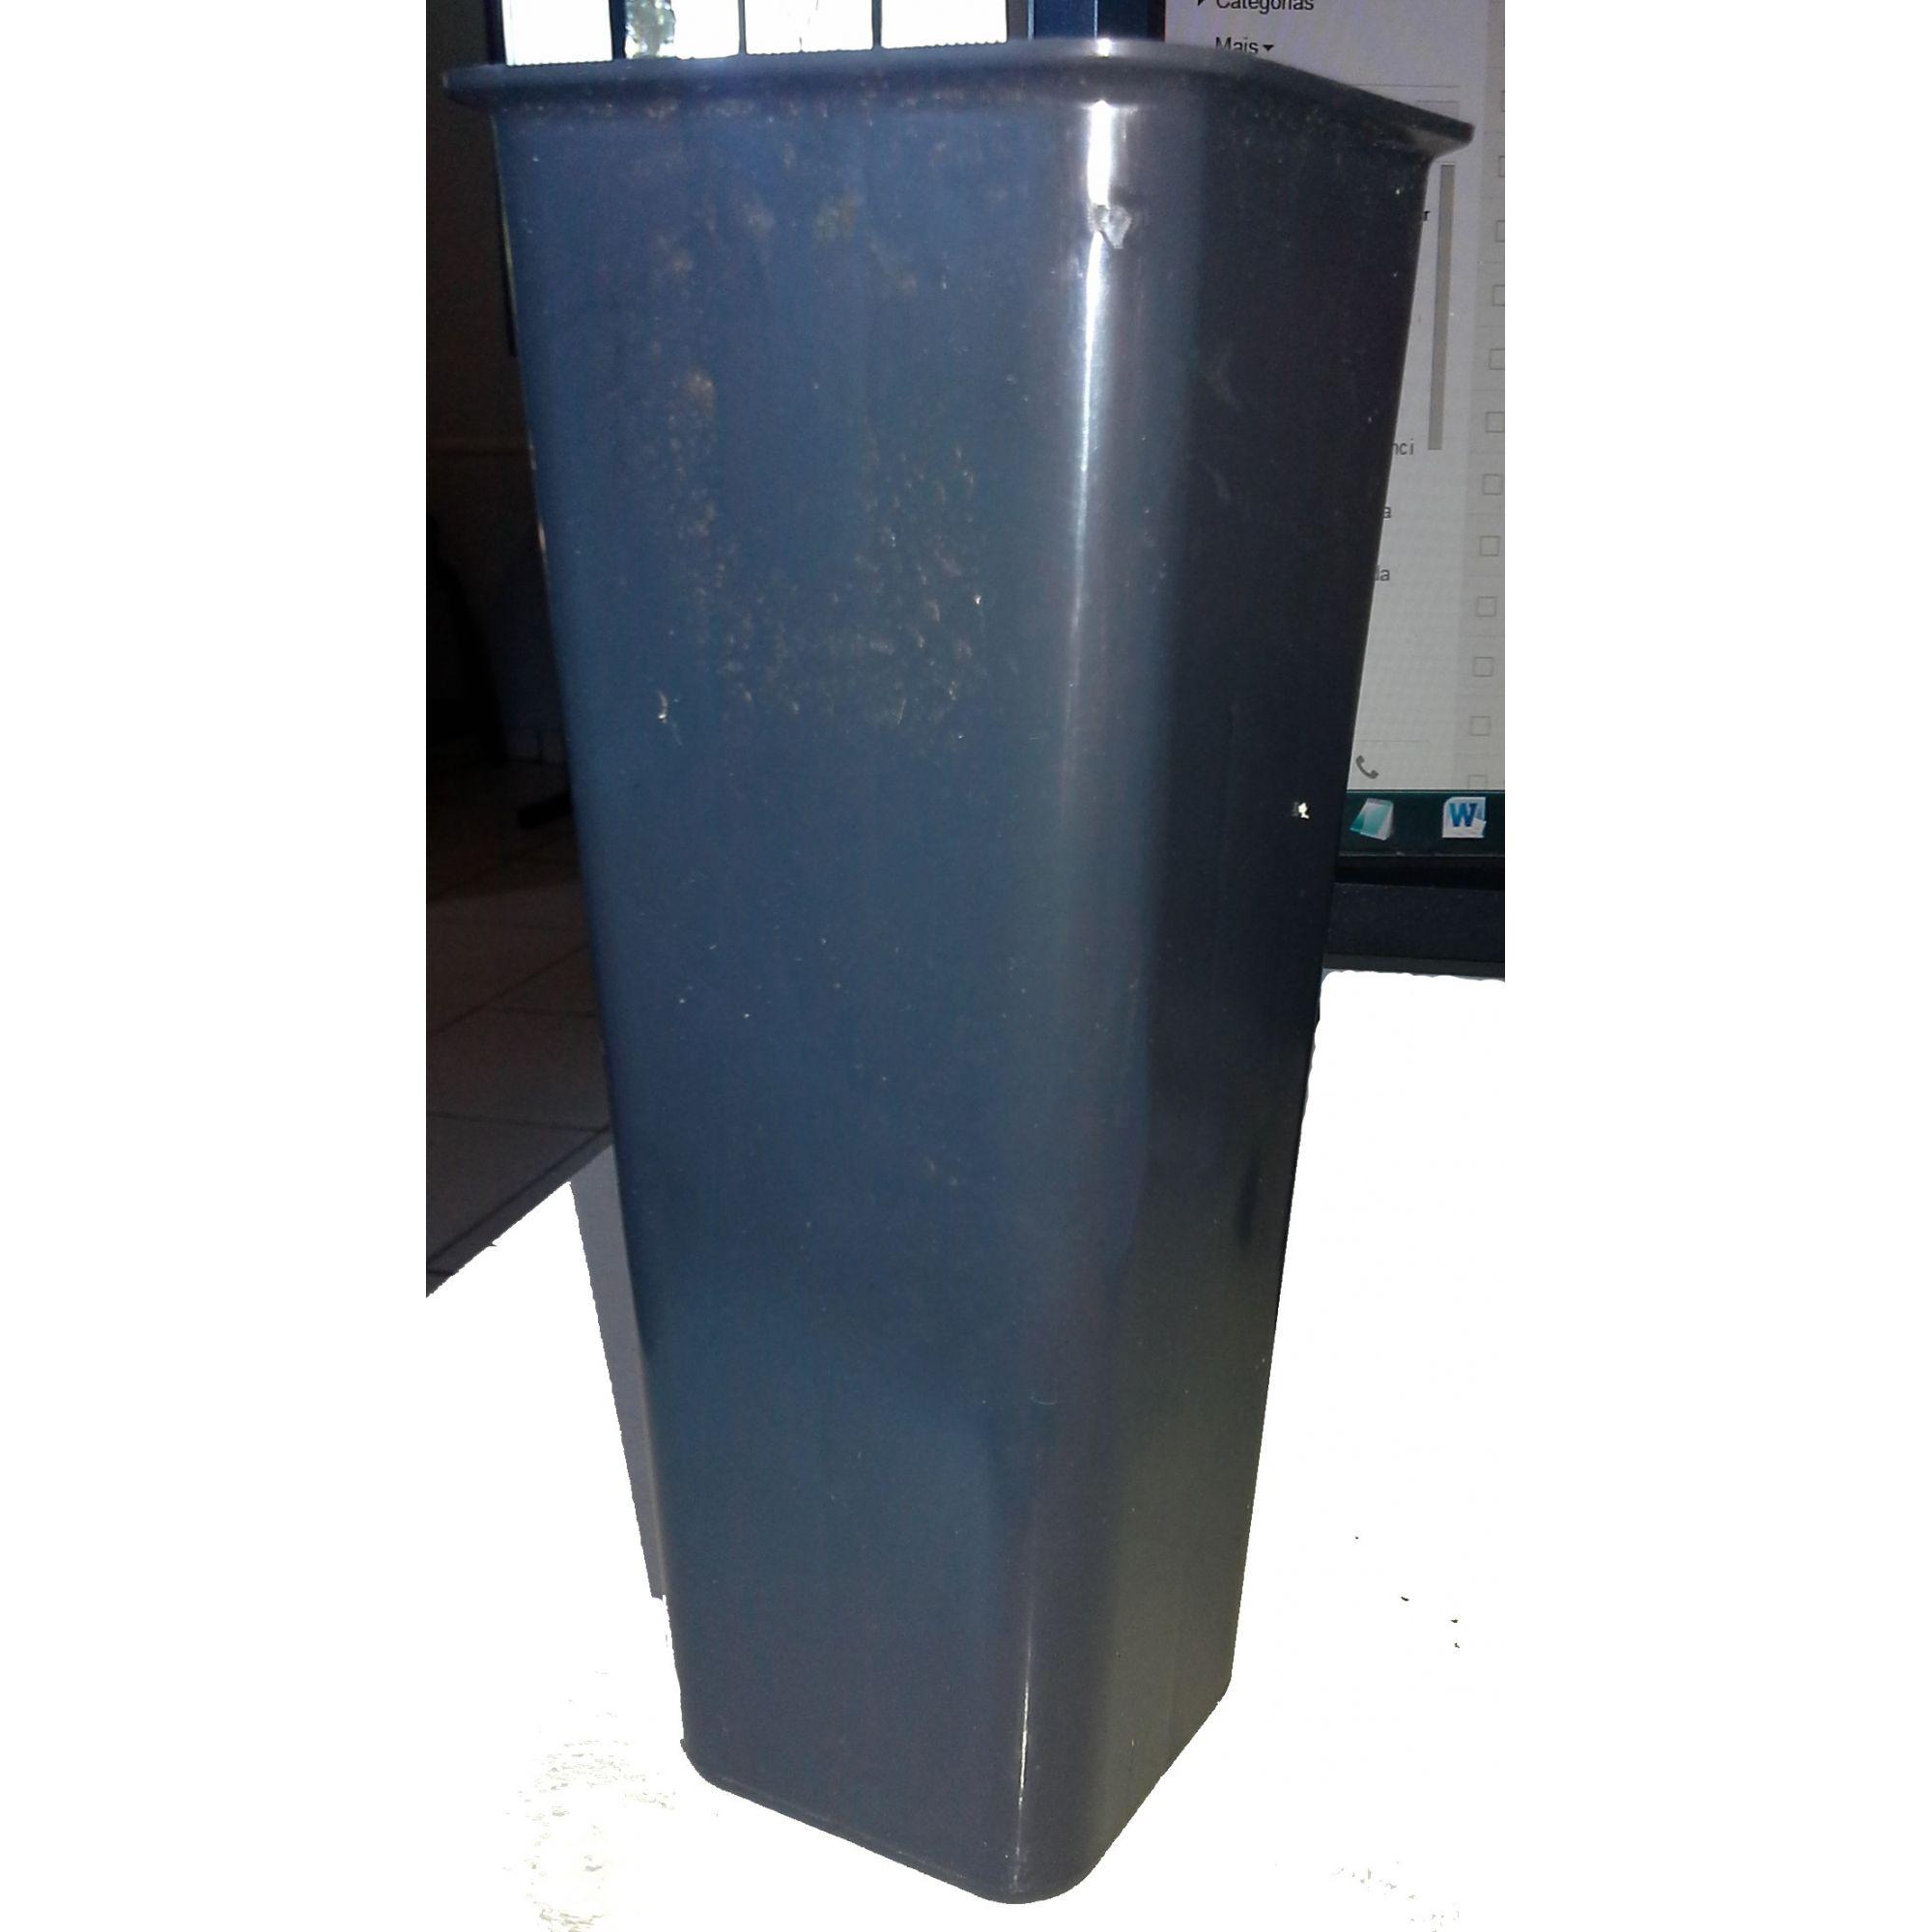 Tubete para mudas - 820 cm³ - Pacote